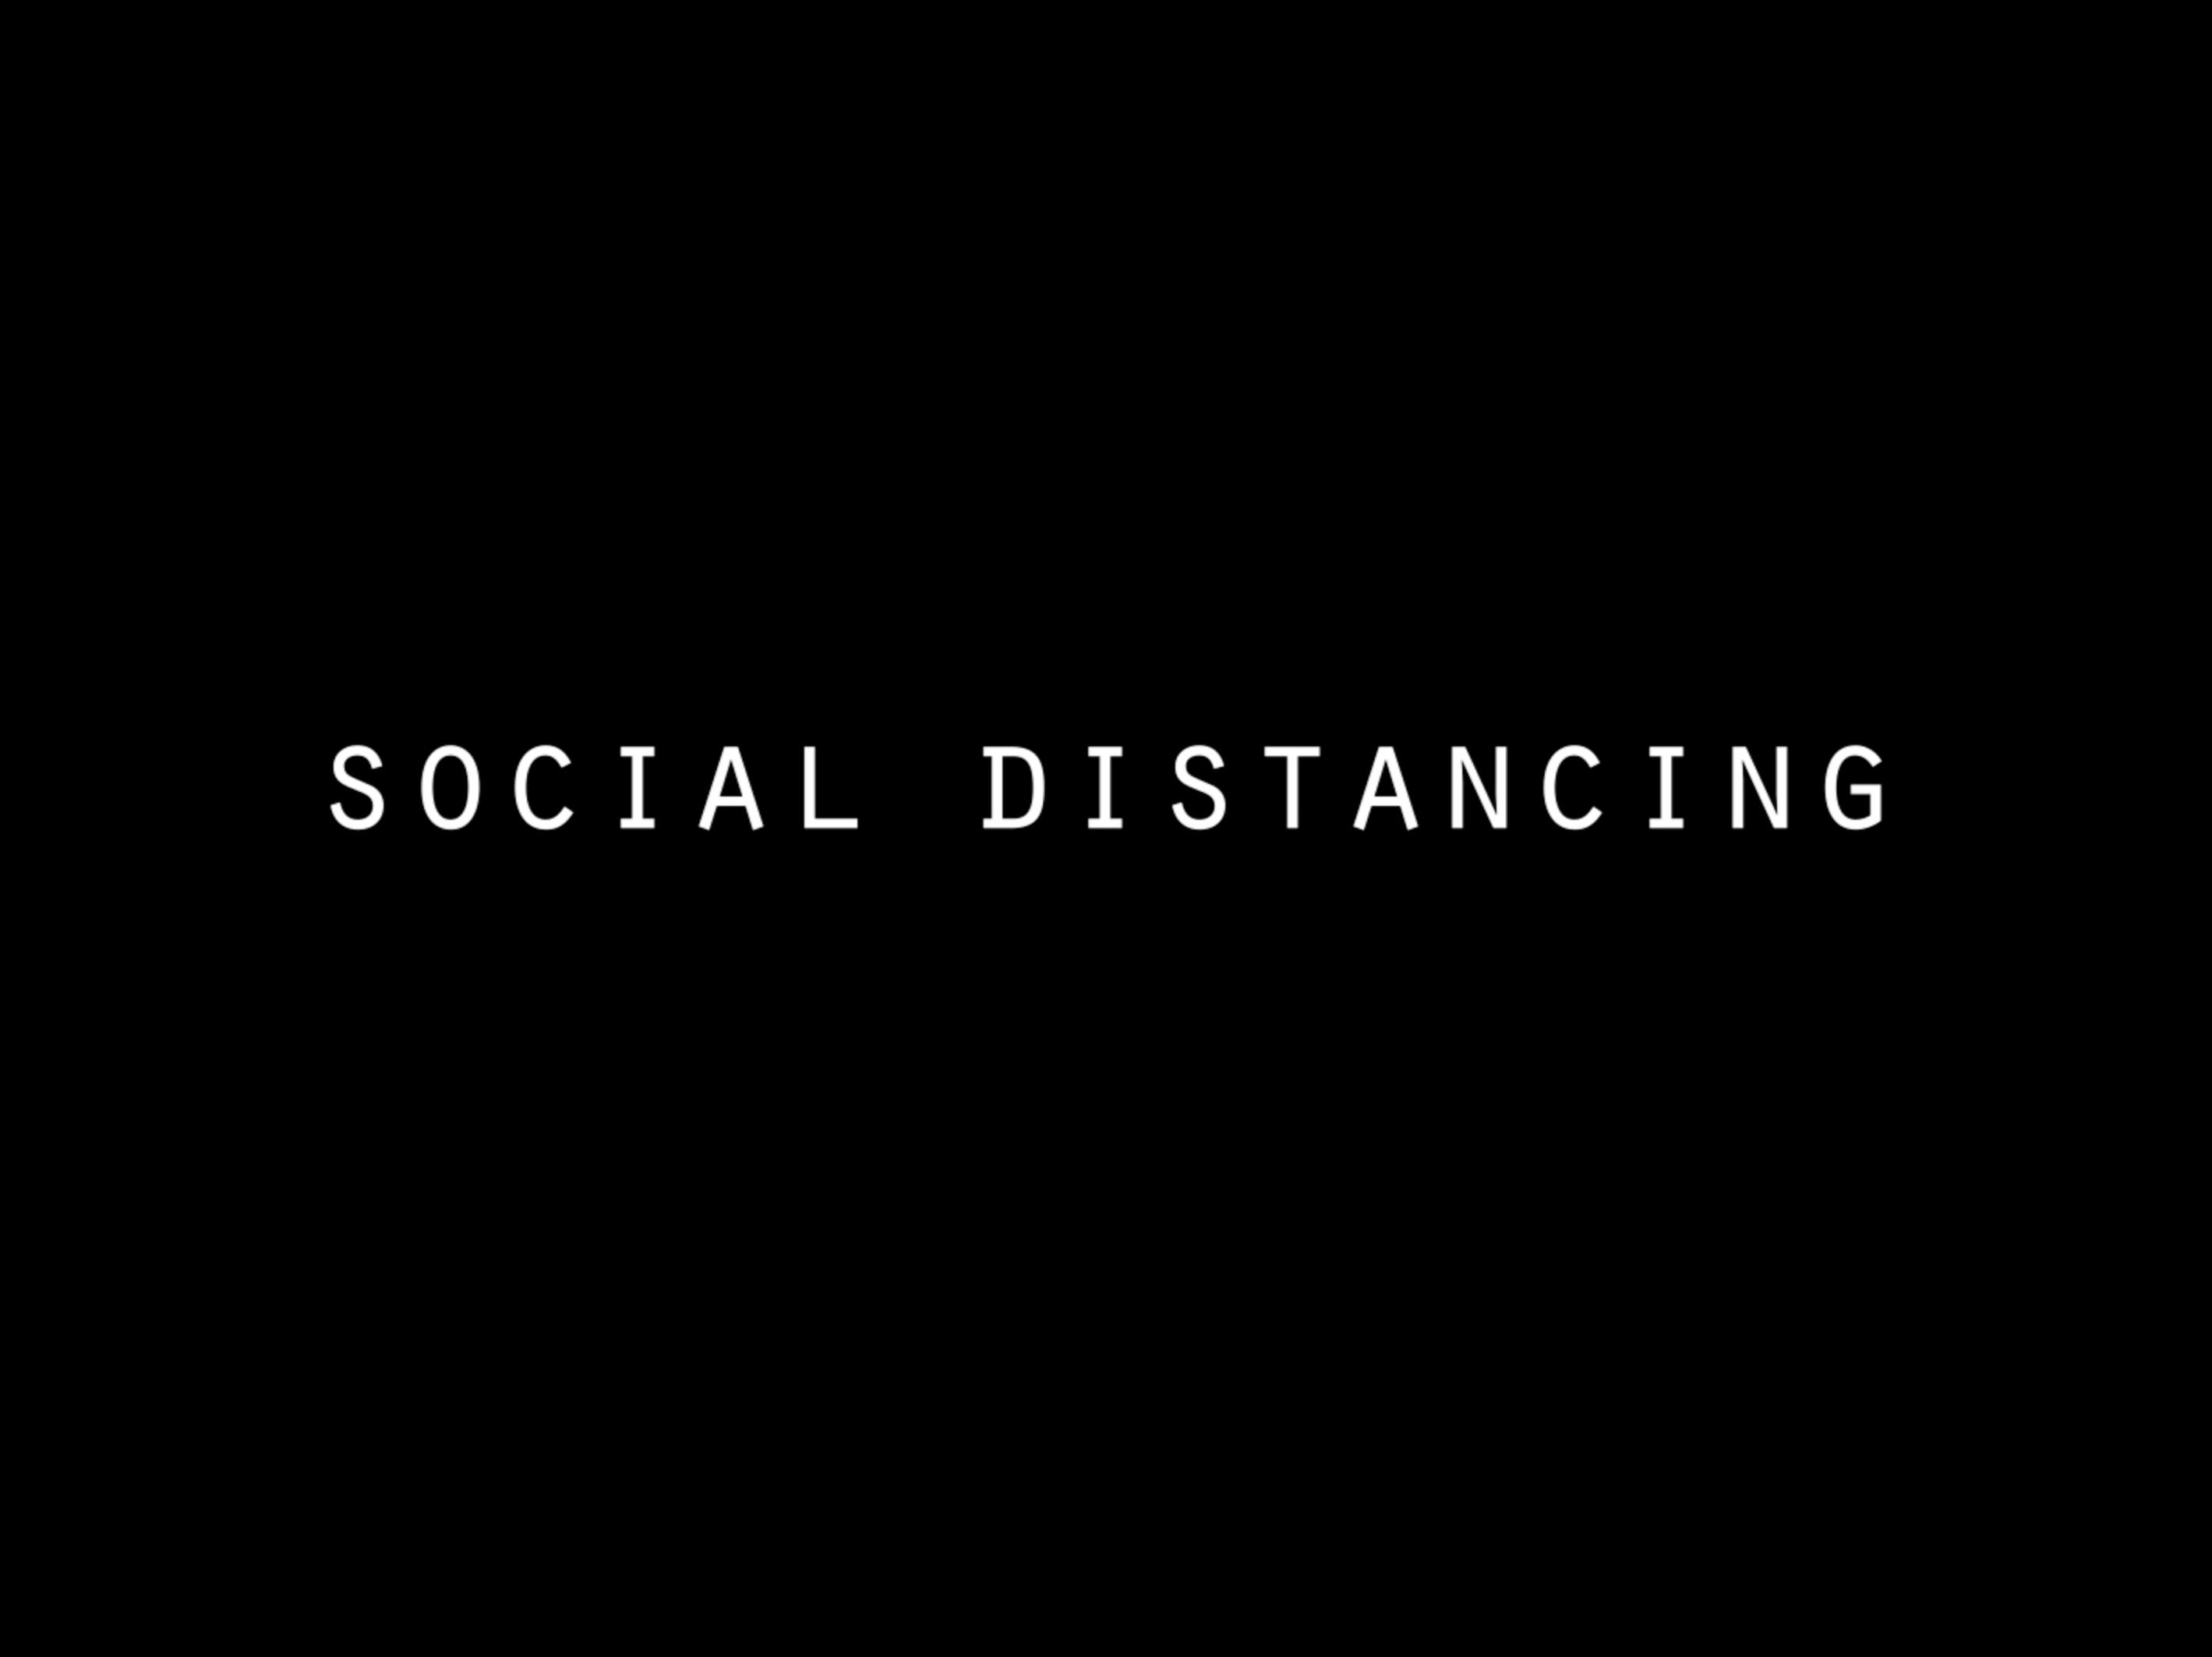 Social Distancing - My RØDE Reel 2020